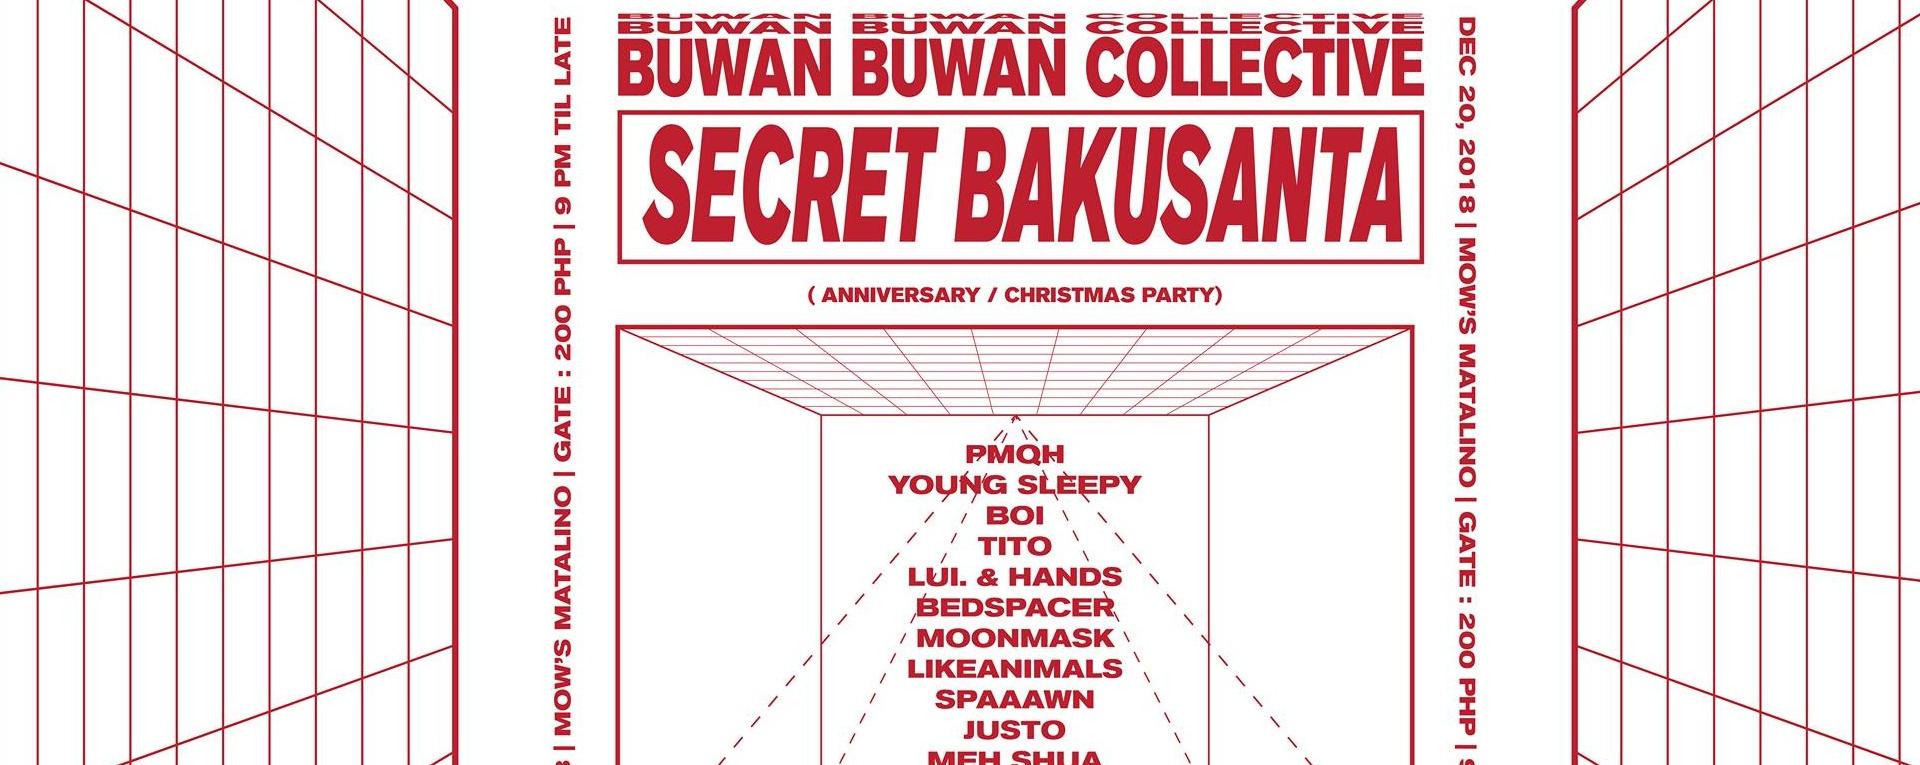 Bakunawa : Secret Bakusanta (Christmas/Anniv Special)